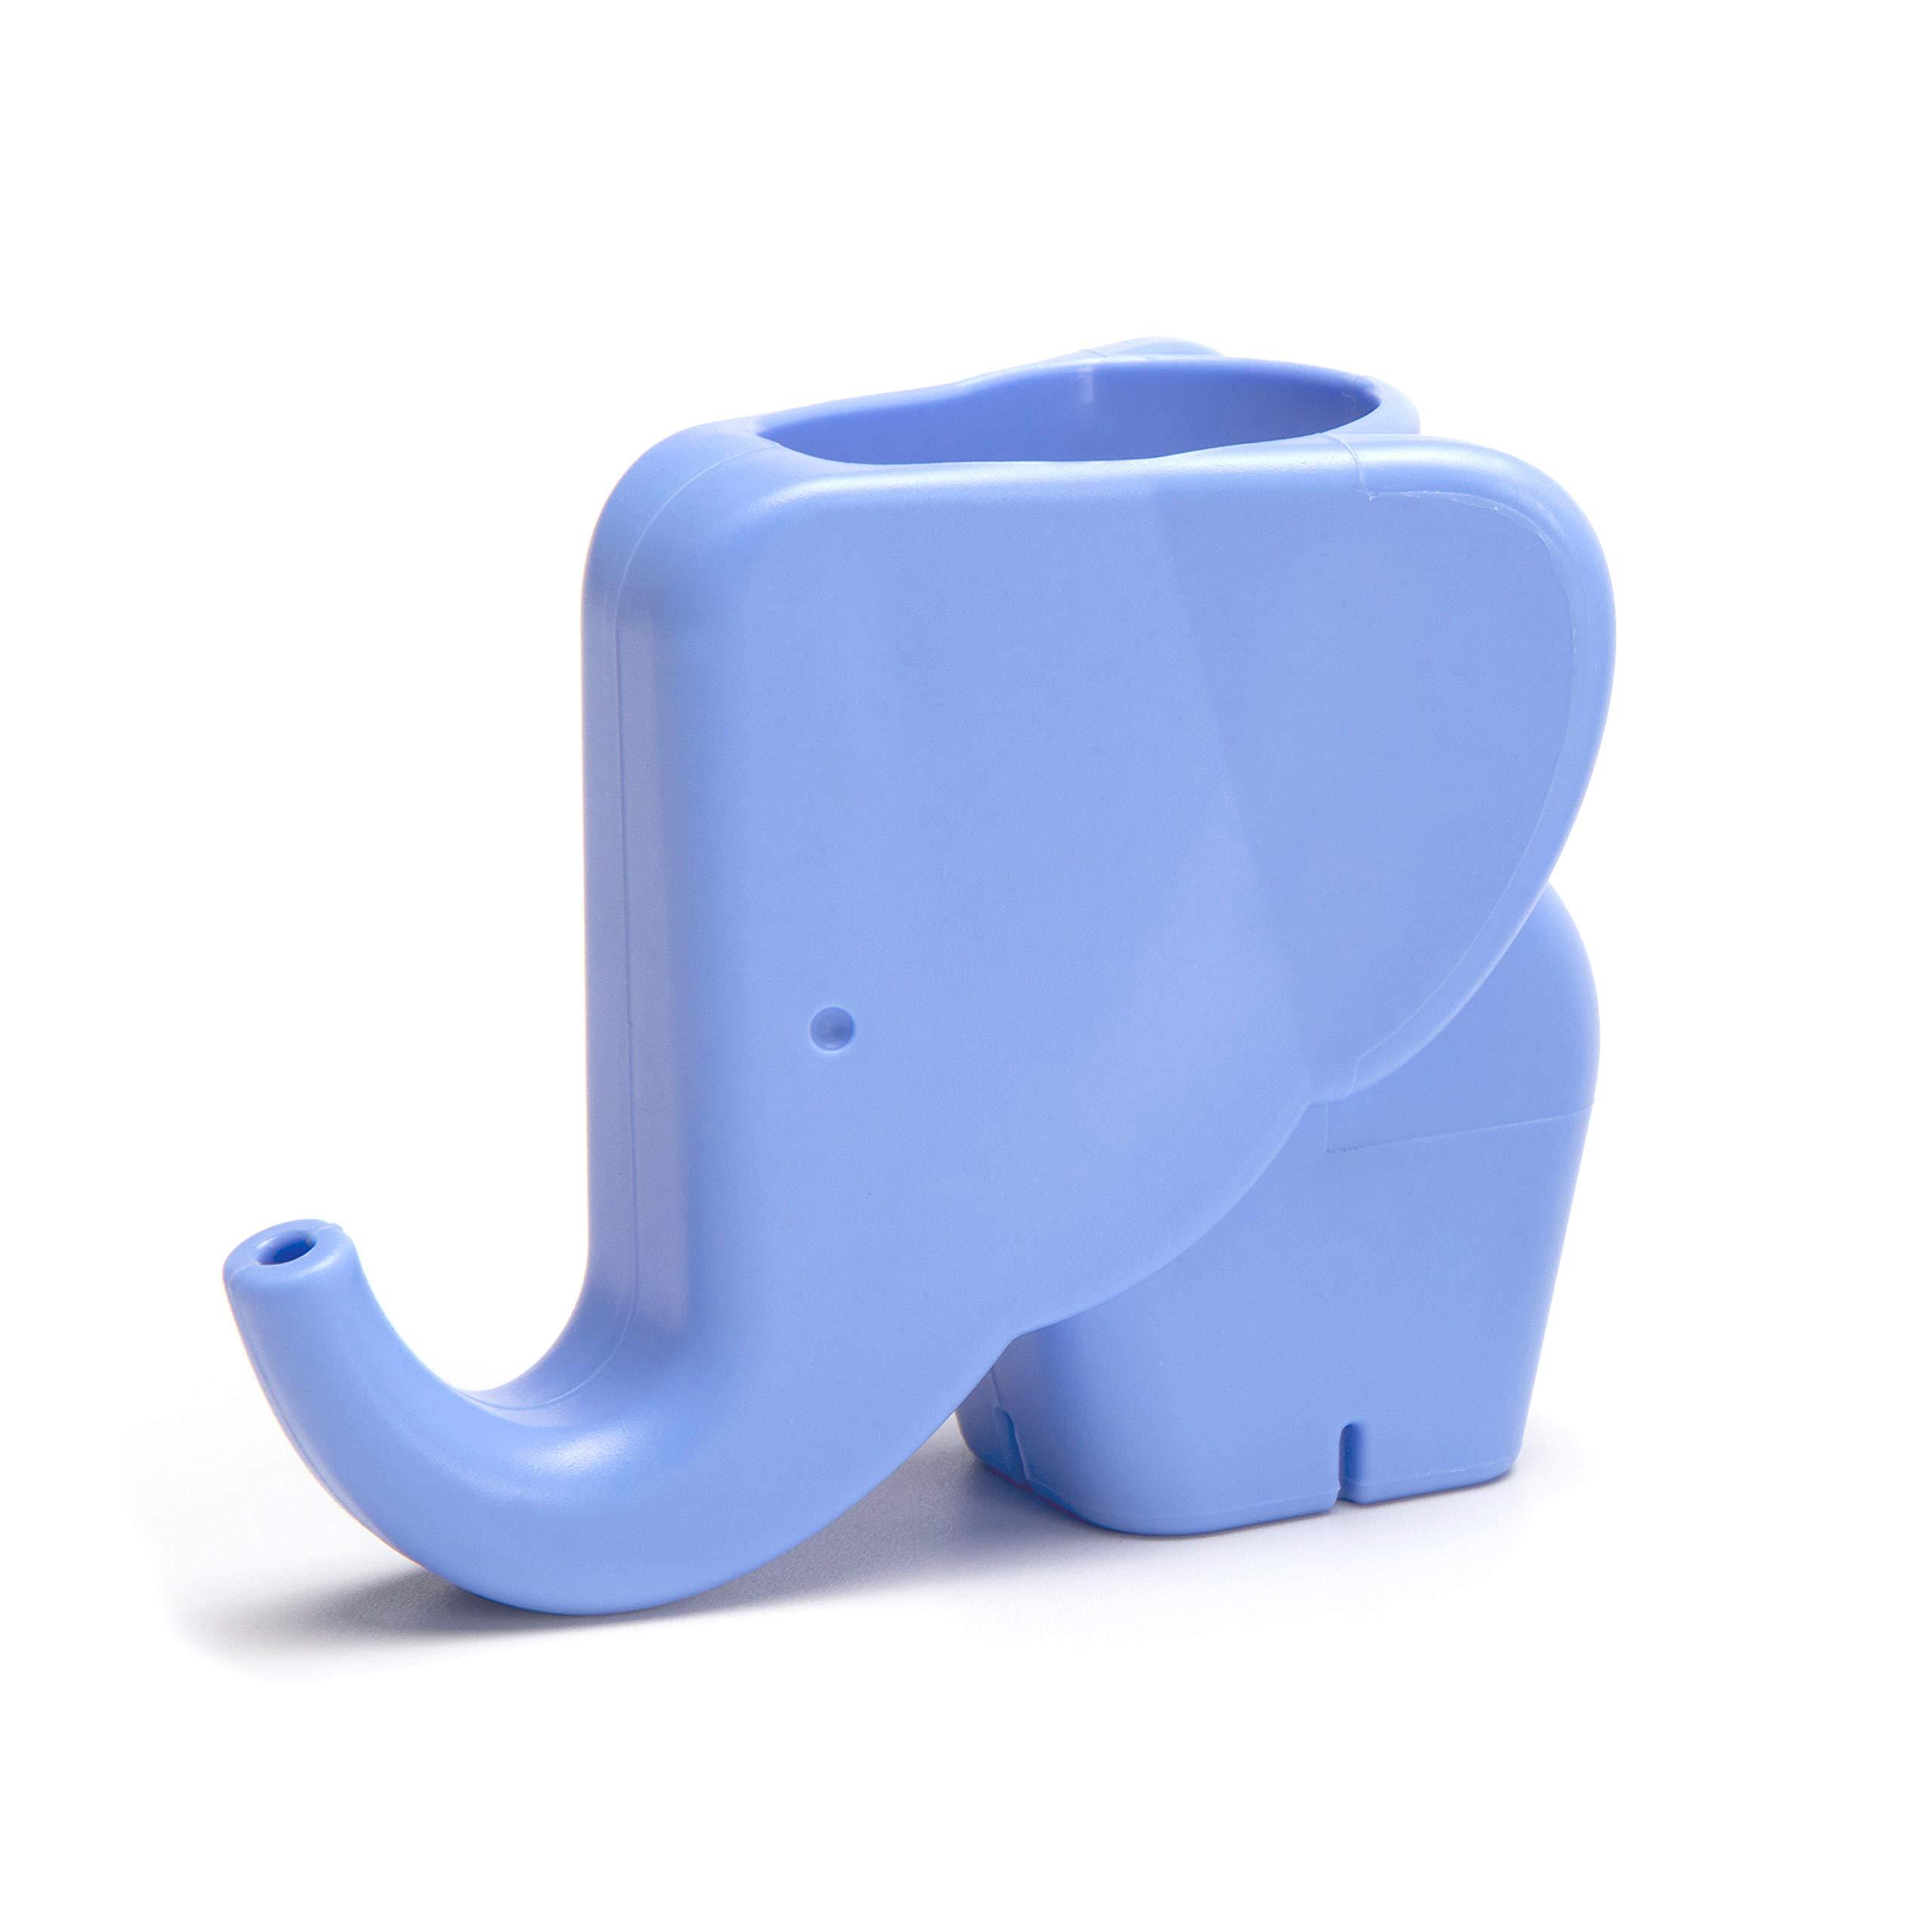 Peleg Design Jumbo Jr. Elephant Faucet Extender for Toddlers Children and Kids, Safe Fun Faucet Fountain Hand-Washing Solution, Light Blue